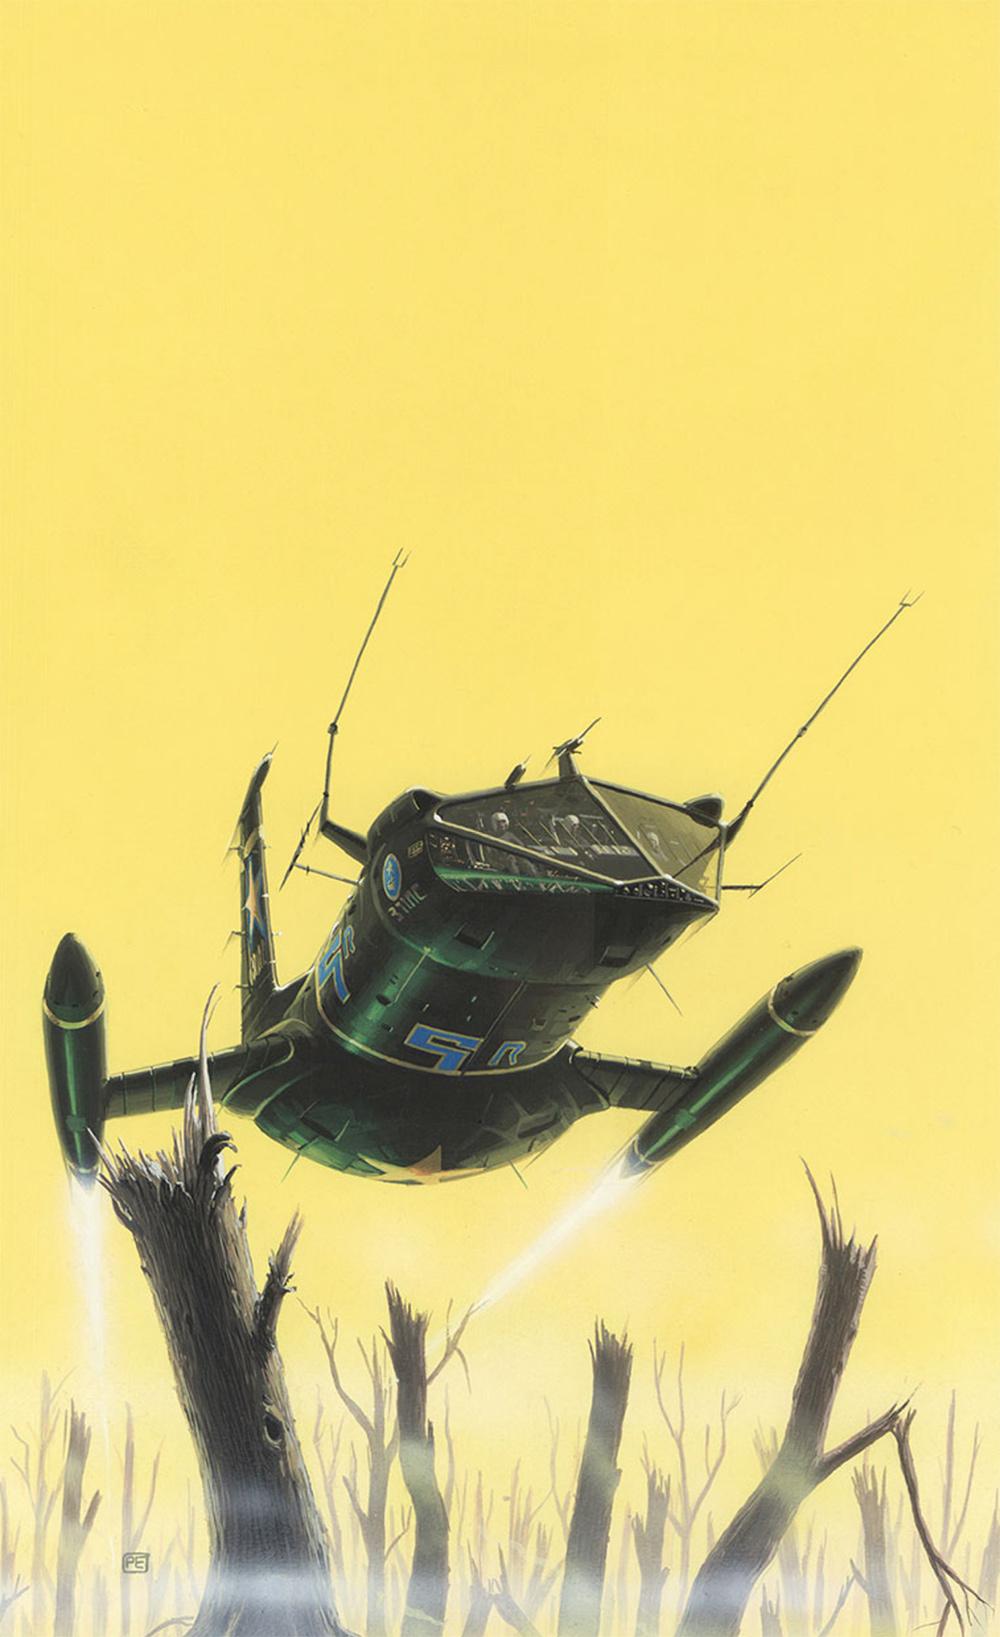 Peter Elson - Star Watchmen